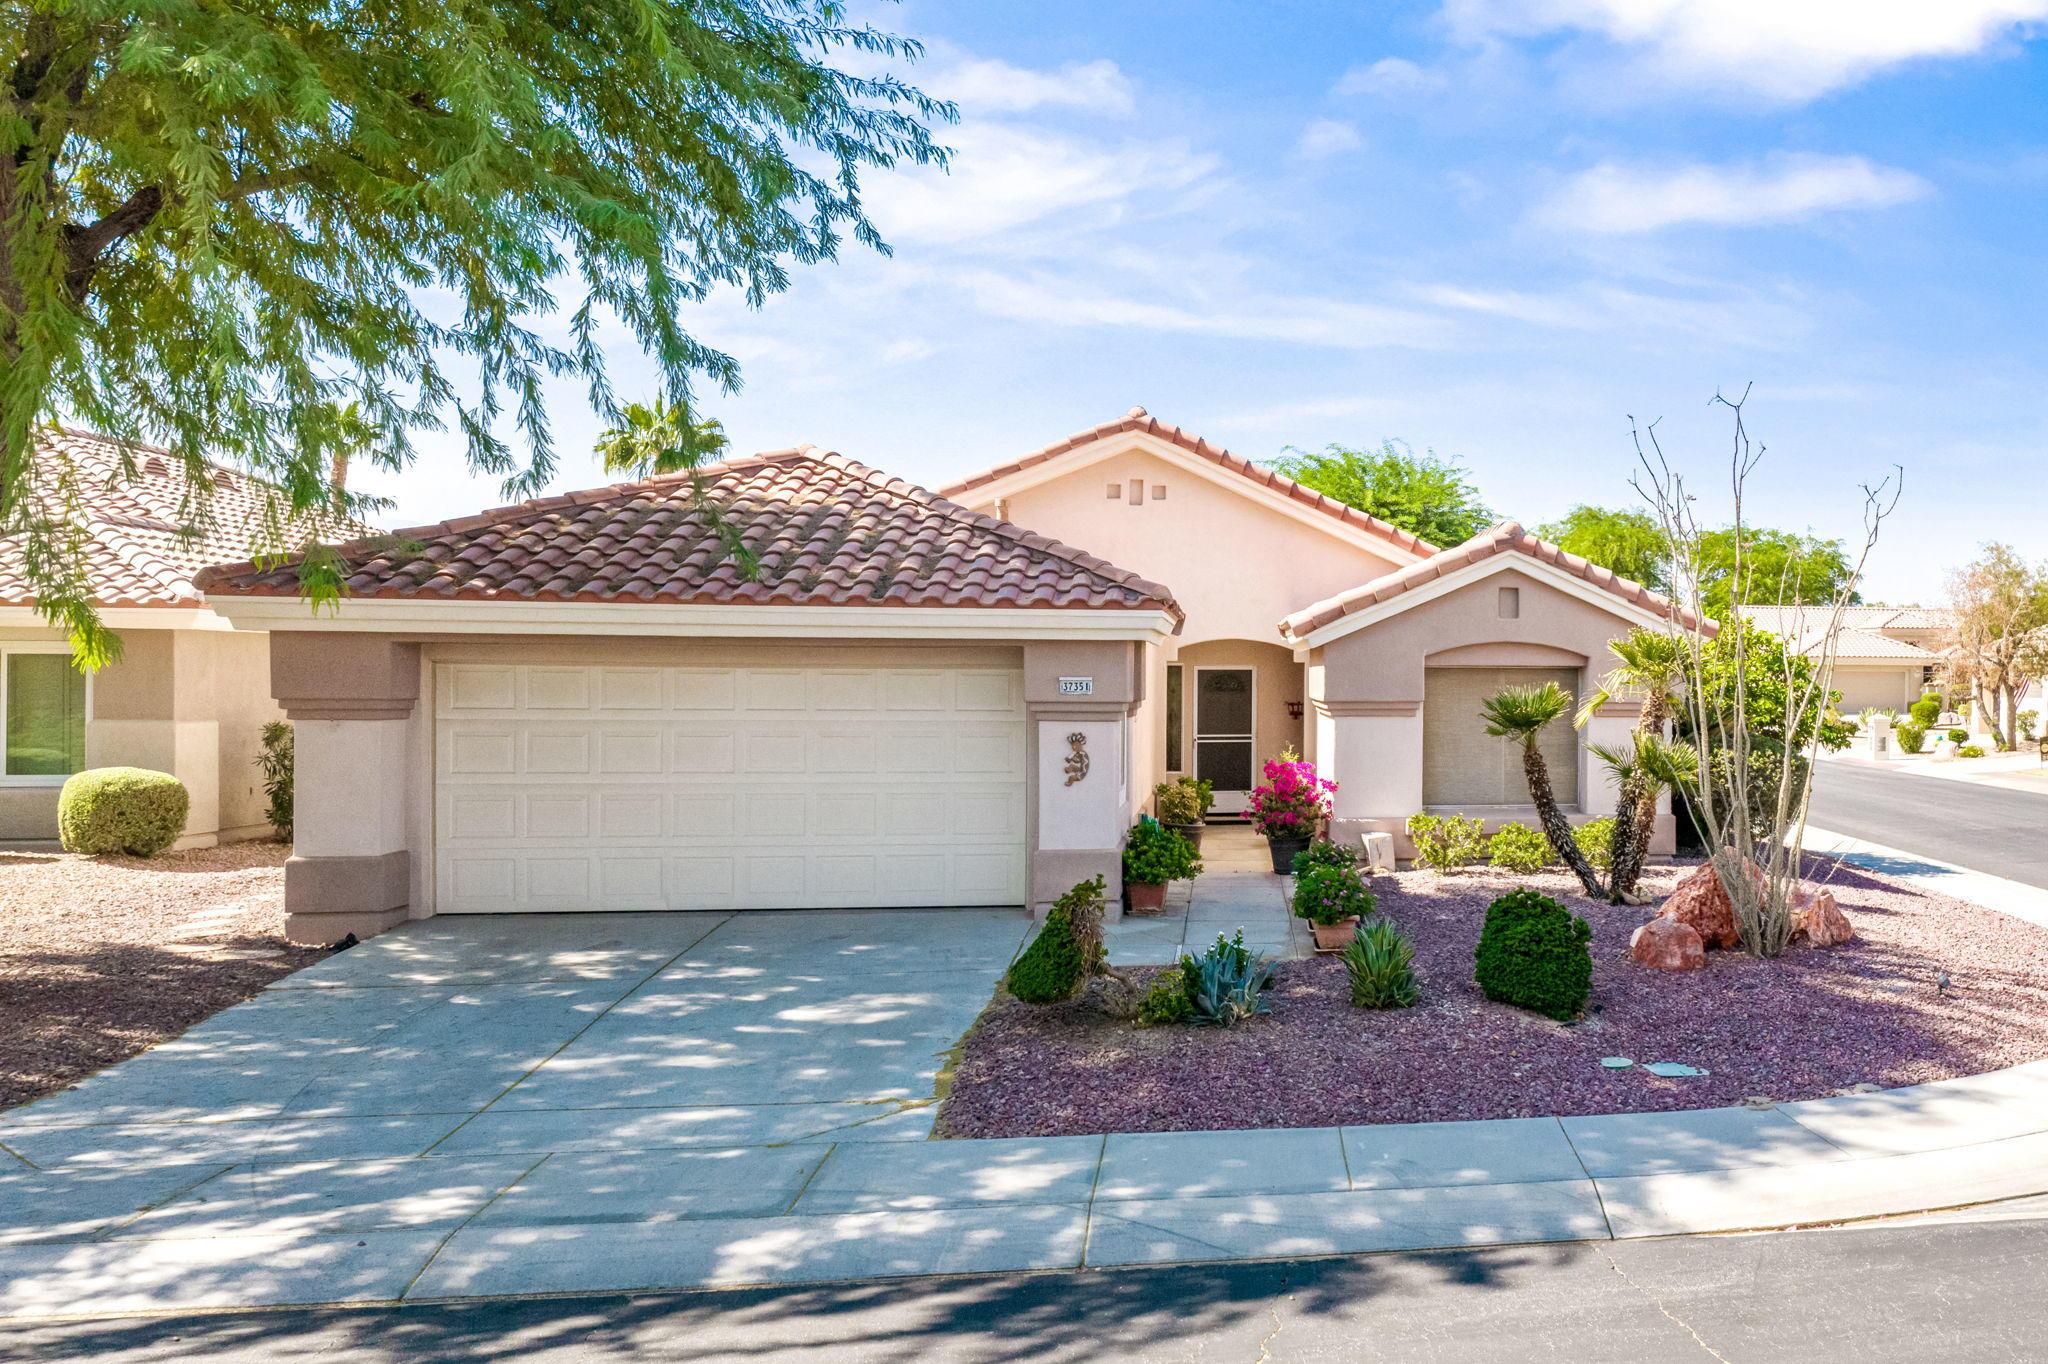 Photo of 37351 Purple Shadow Road, Palm Desert, CA 92211